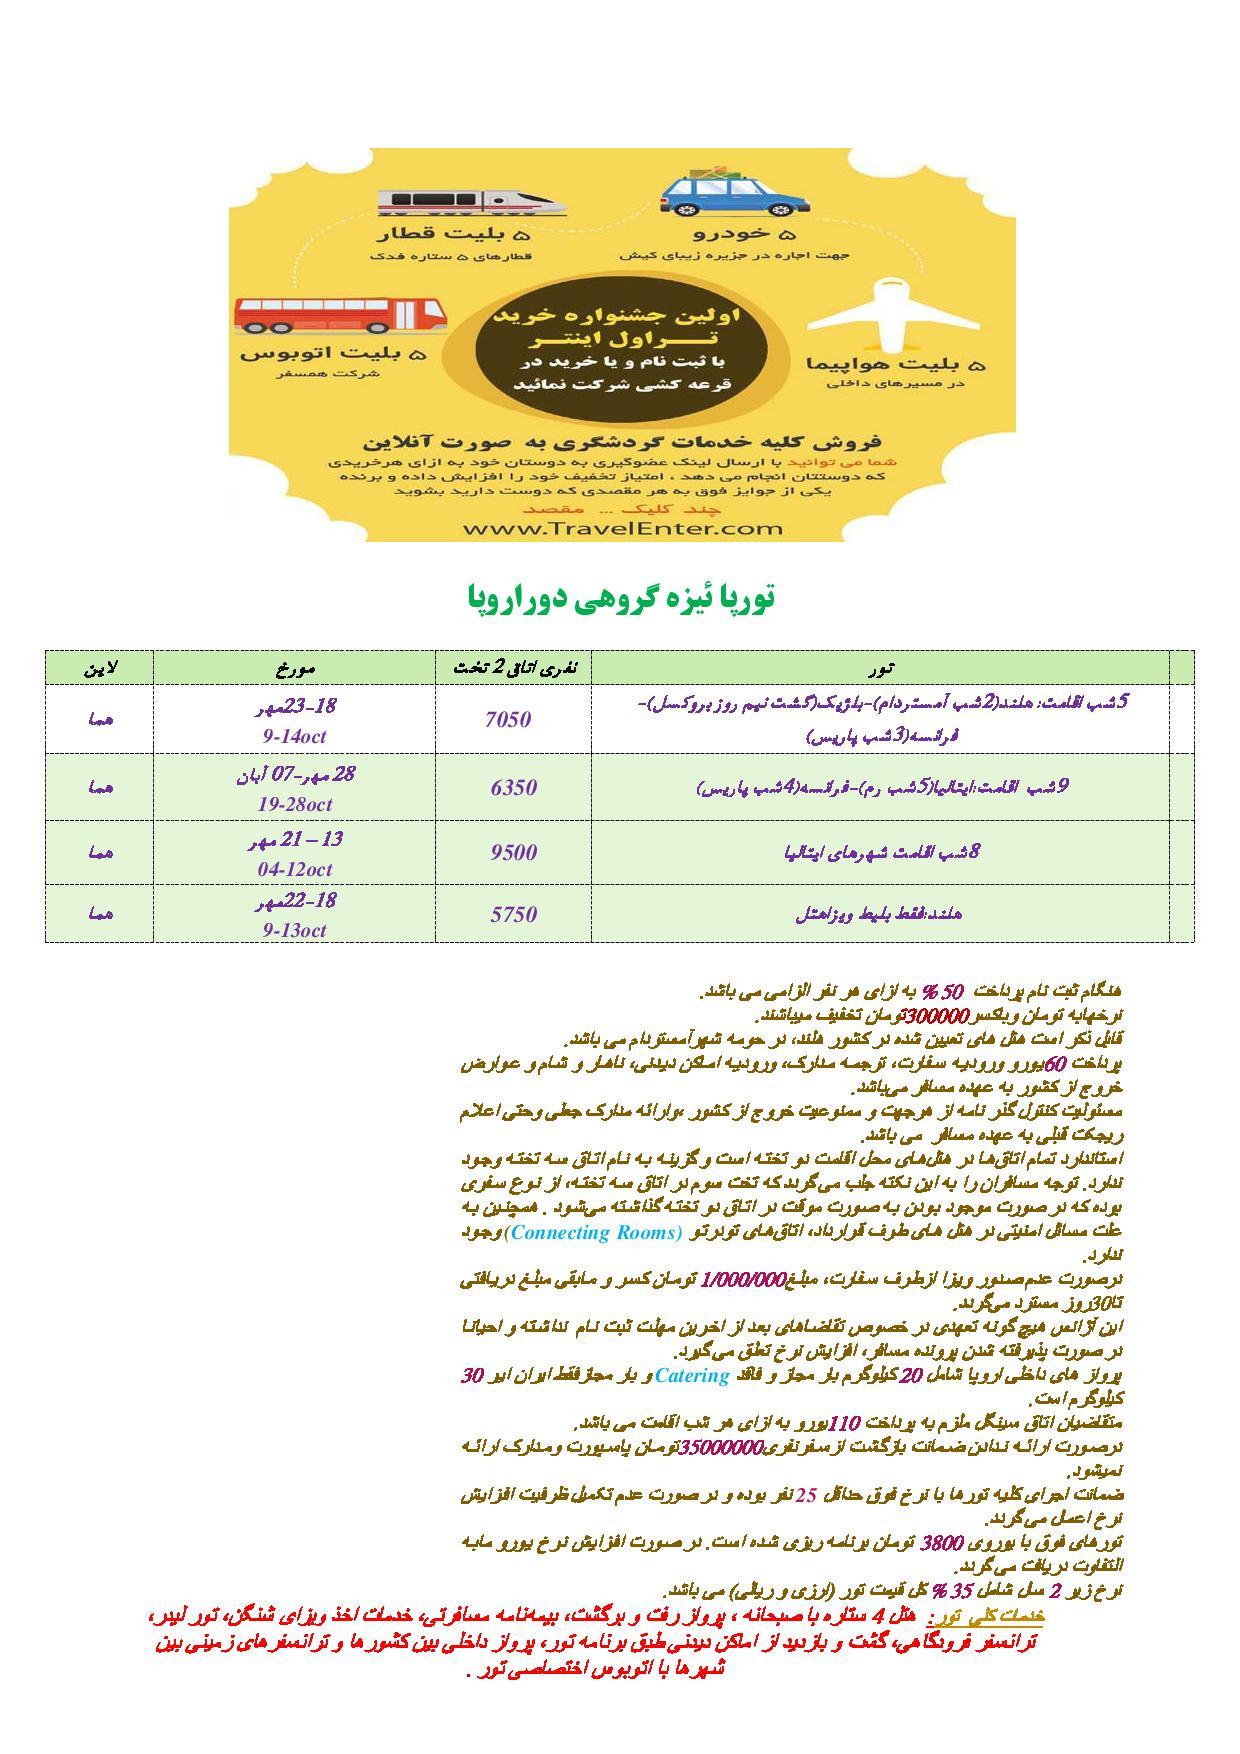 asp-page-0012